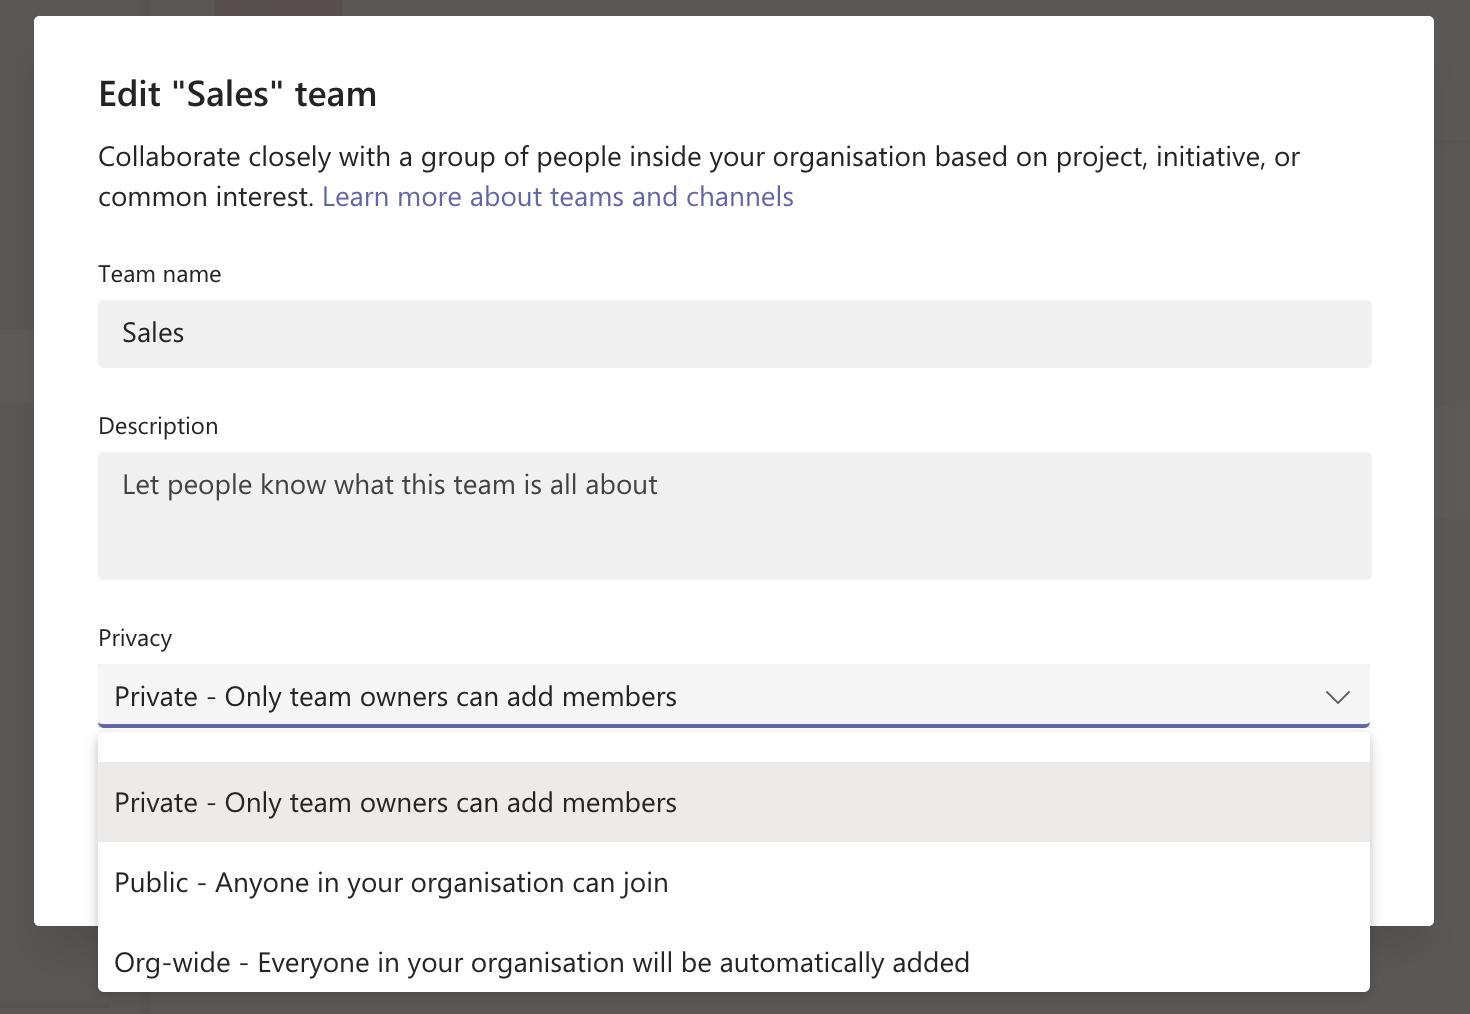 Edit existing team's details on MS Teams